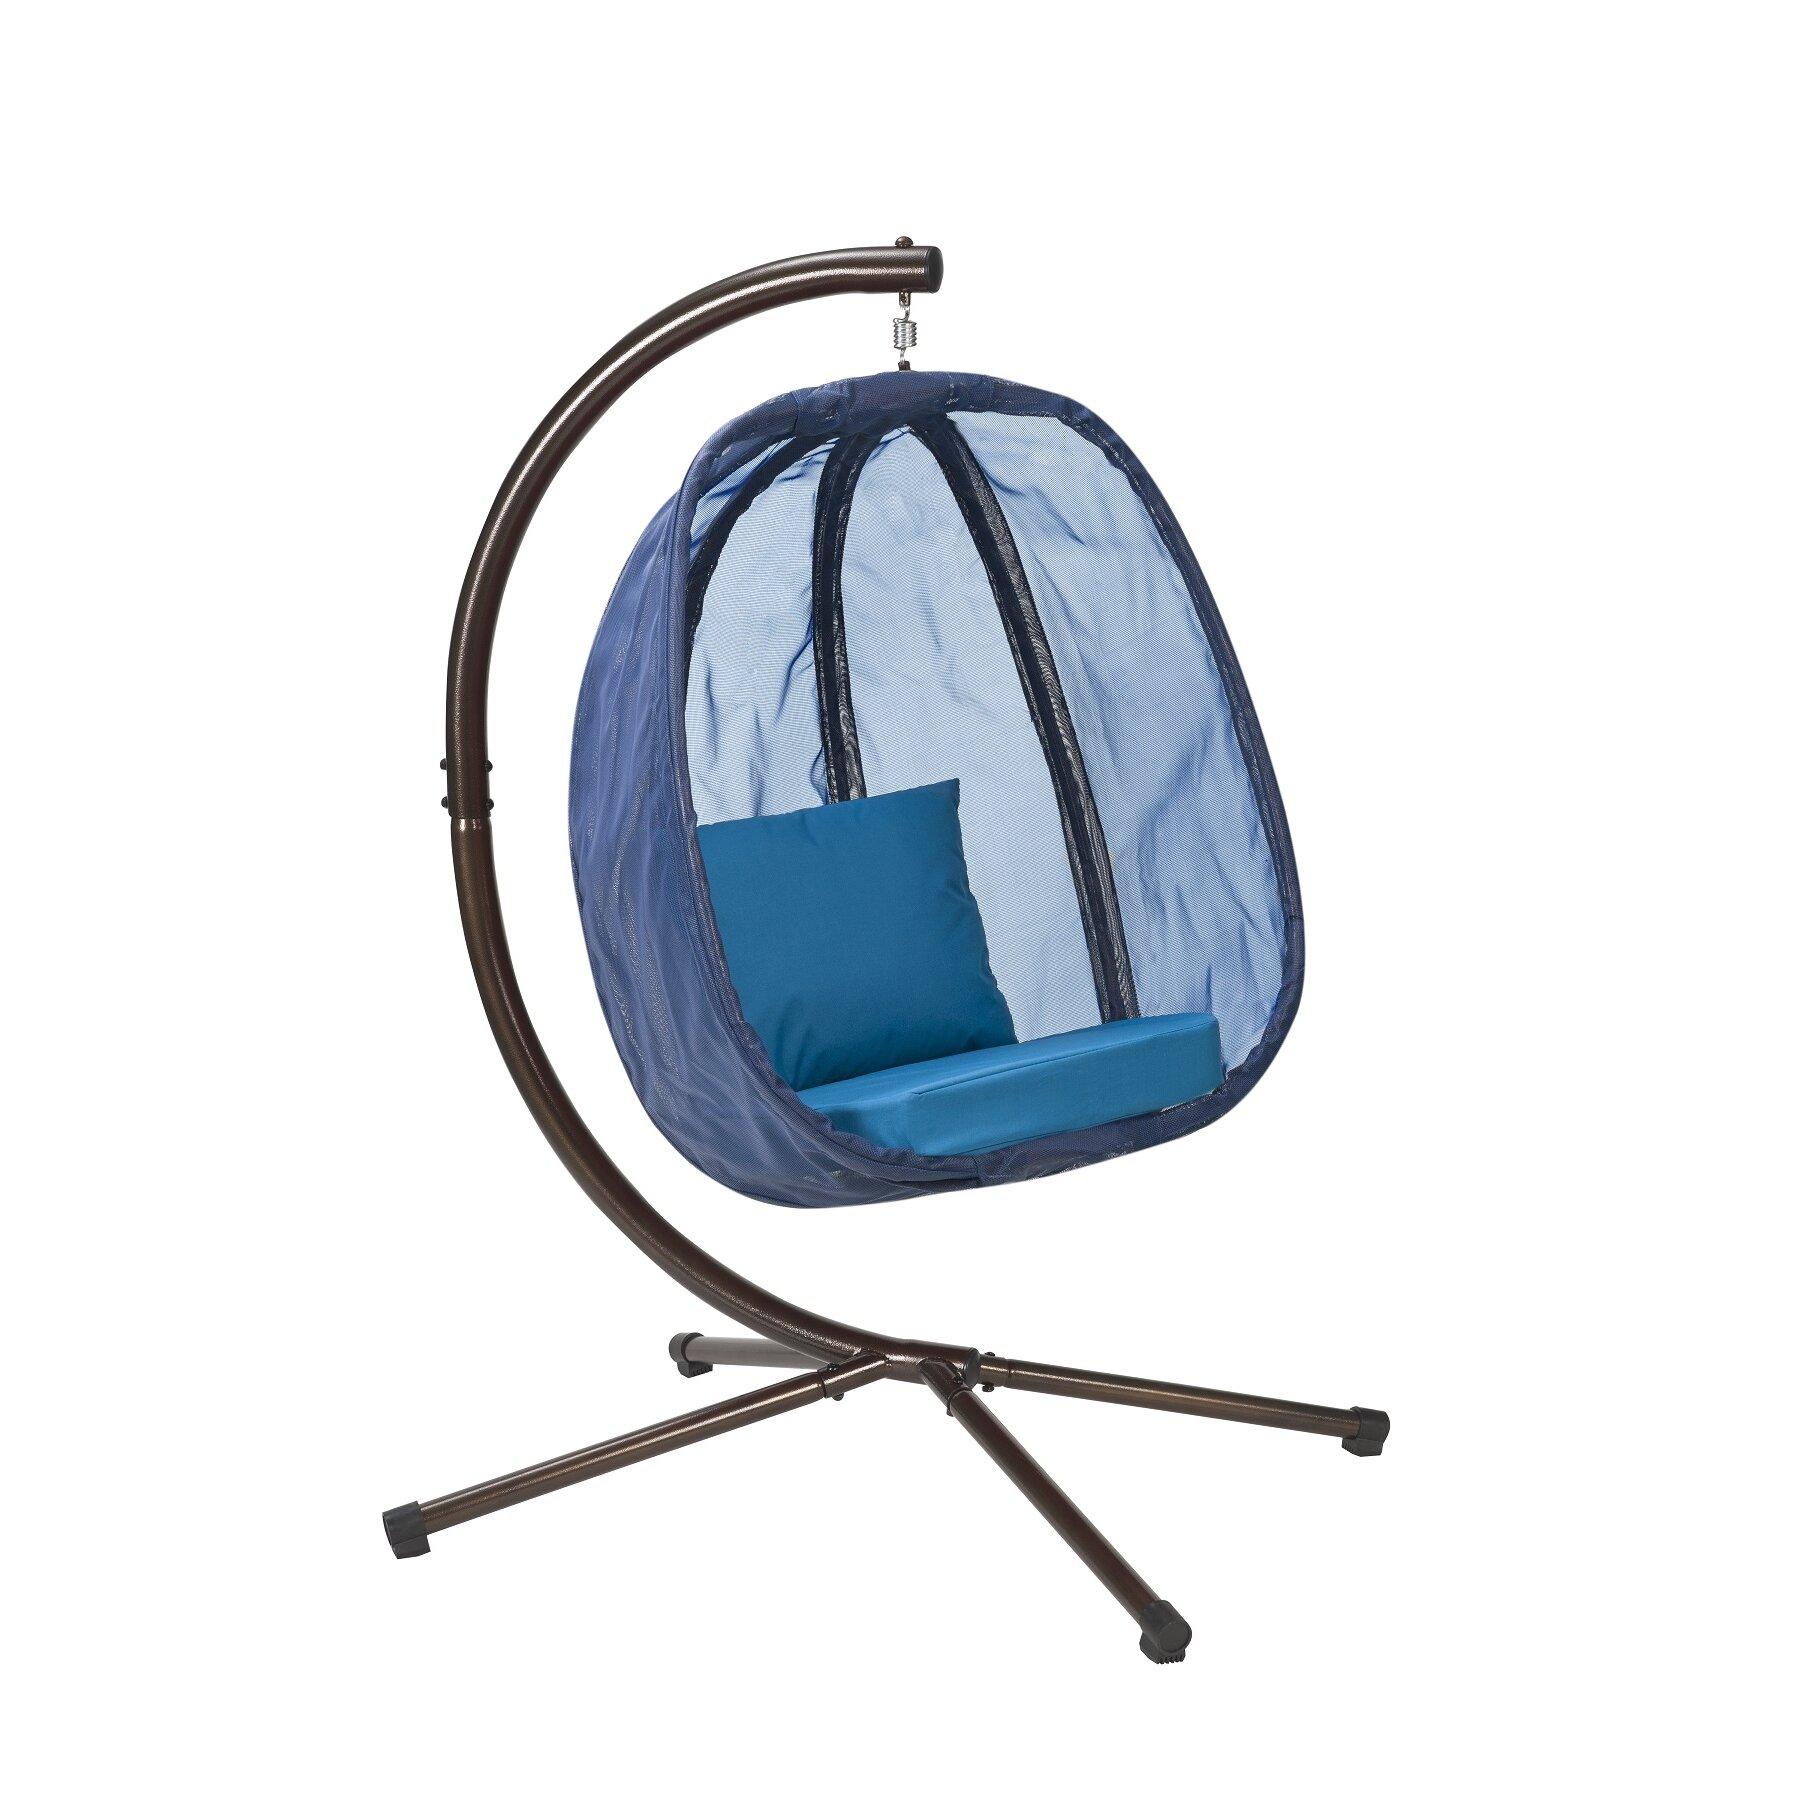 Flowerhouse Egg Chair Hammock Amp Reviews Wayfair